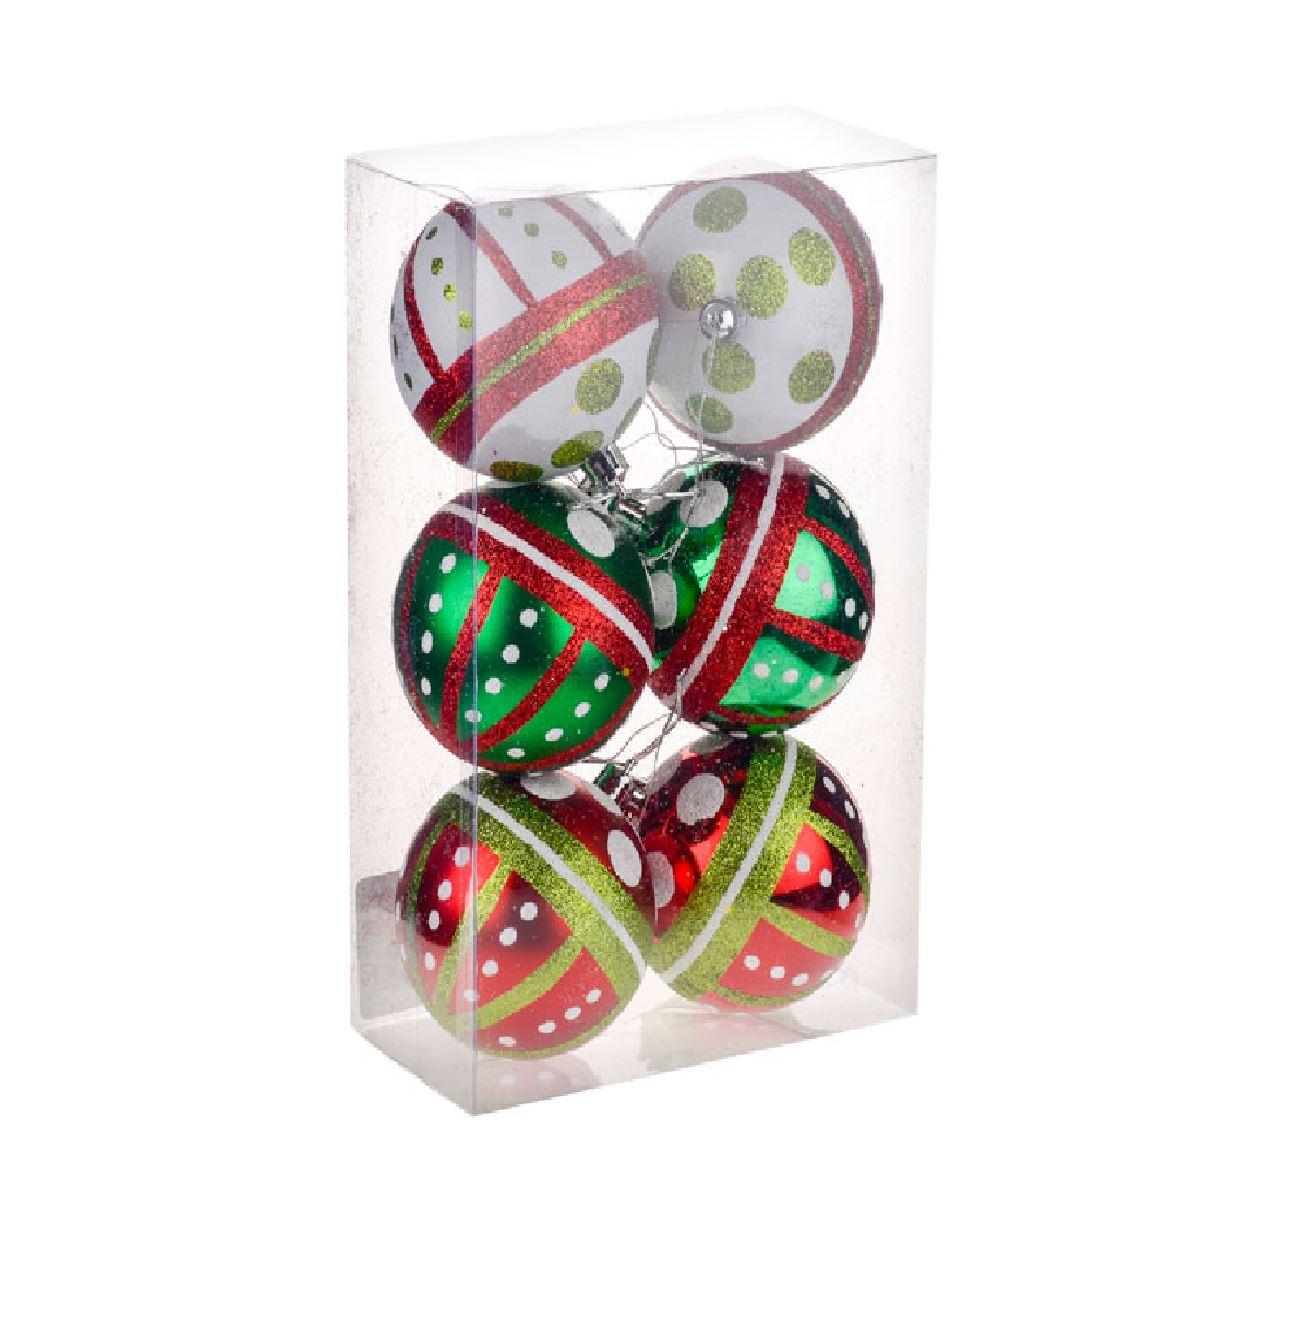 Set-of-6-Multi-Finish-Xmas-Christmas-Tree-Hanging-Baubles-Decoration-Home-Gift